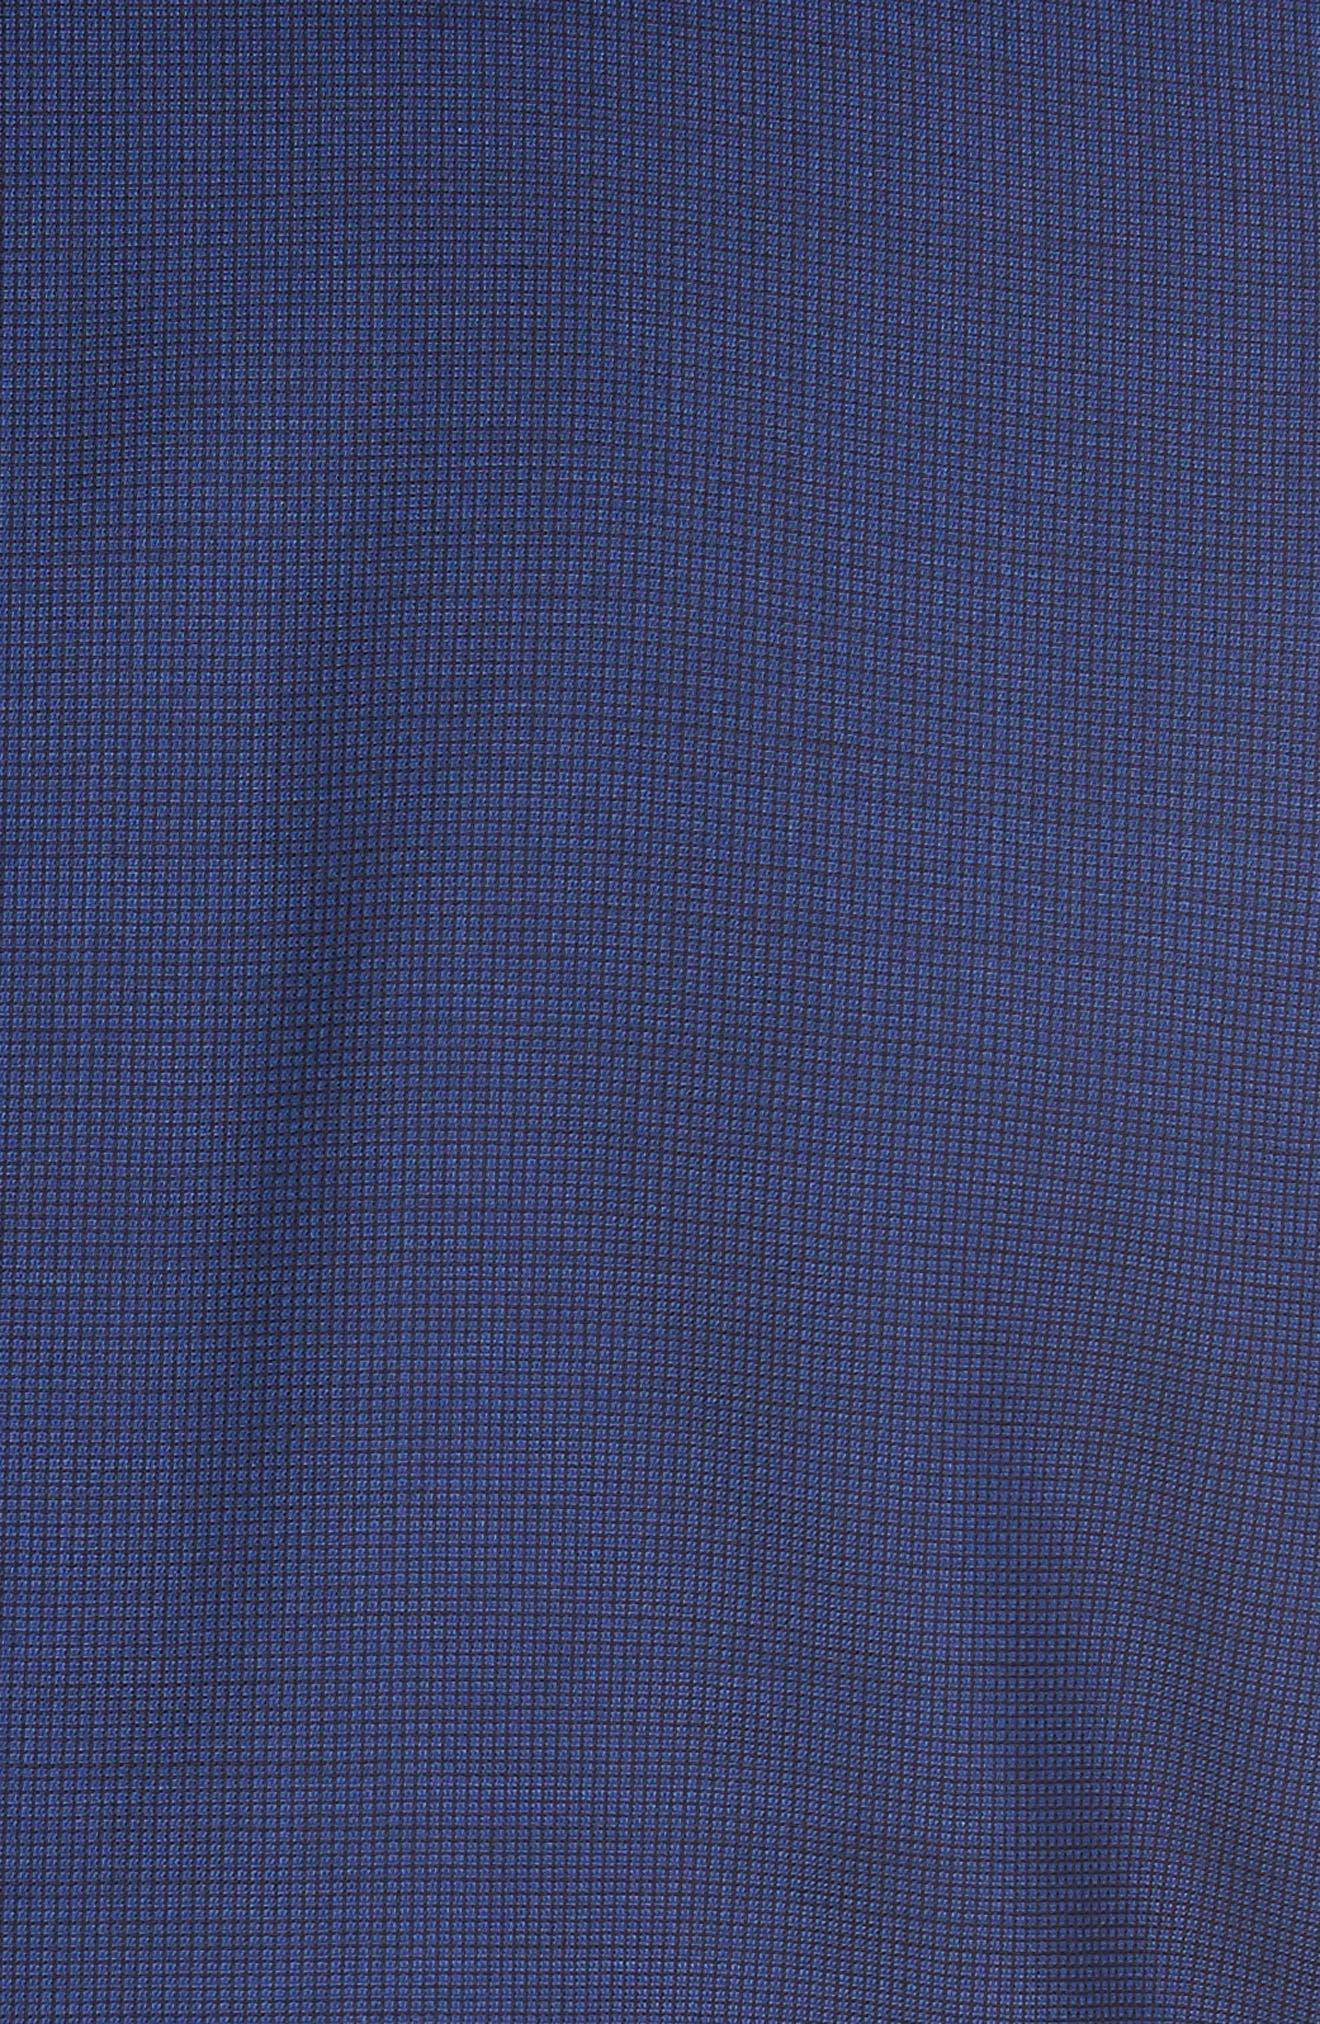 Trim Fit Solid Wool Suit,                             Alternate thumbnail 7, color,                             Bright Blue